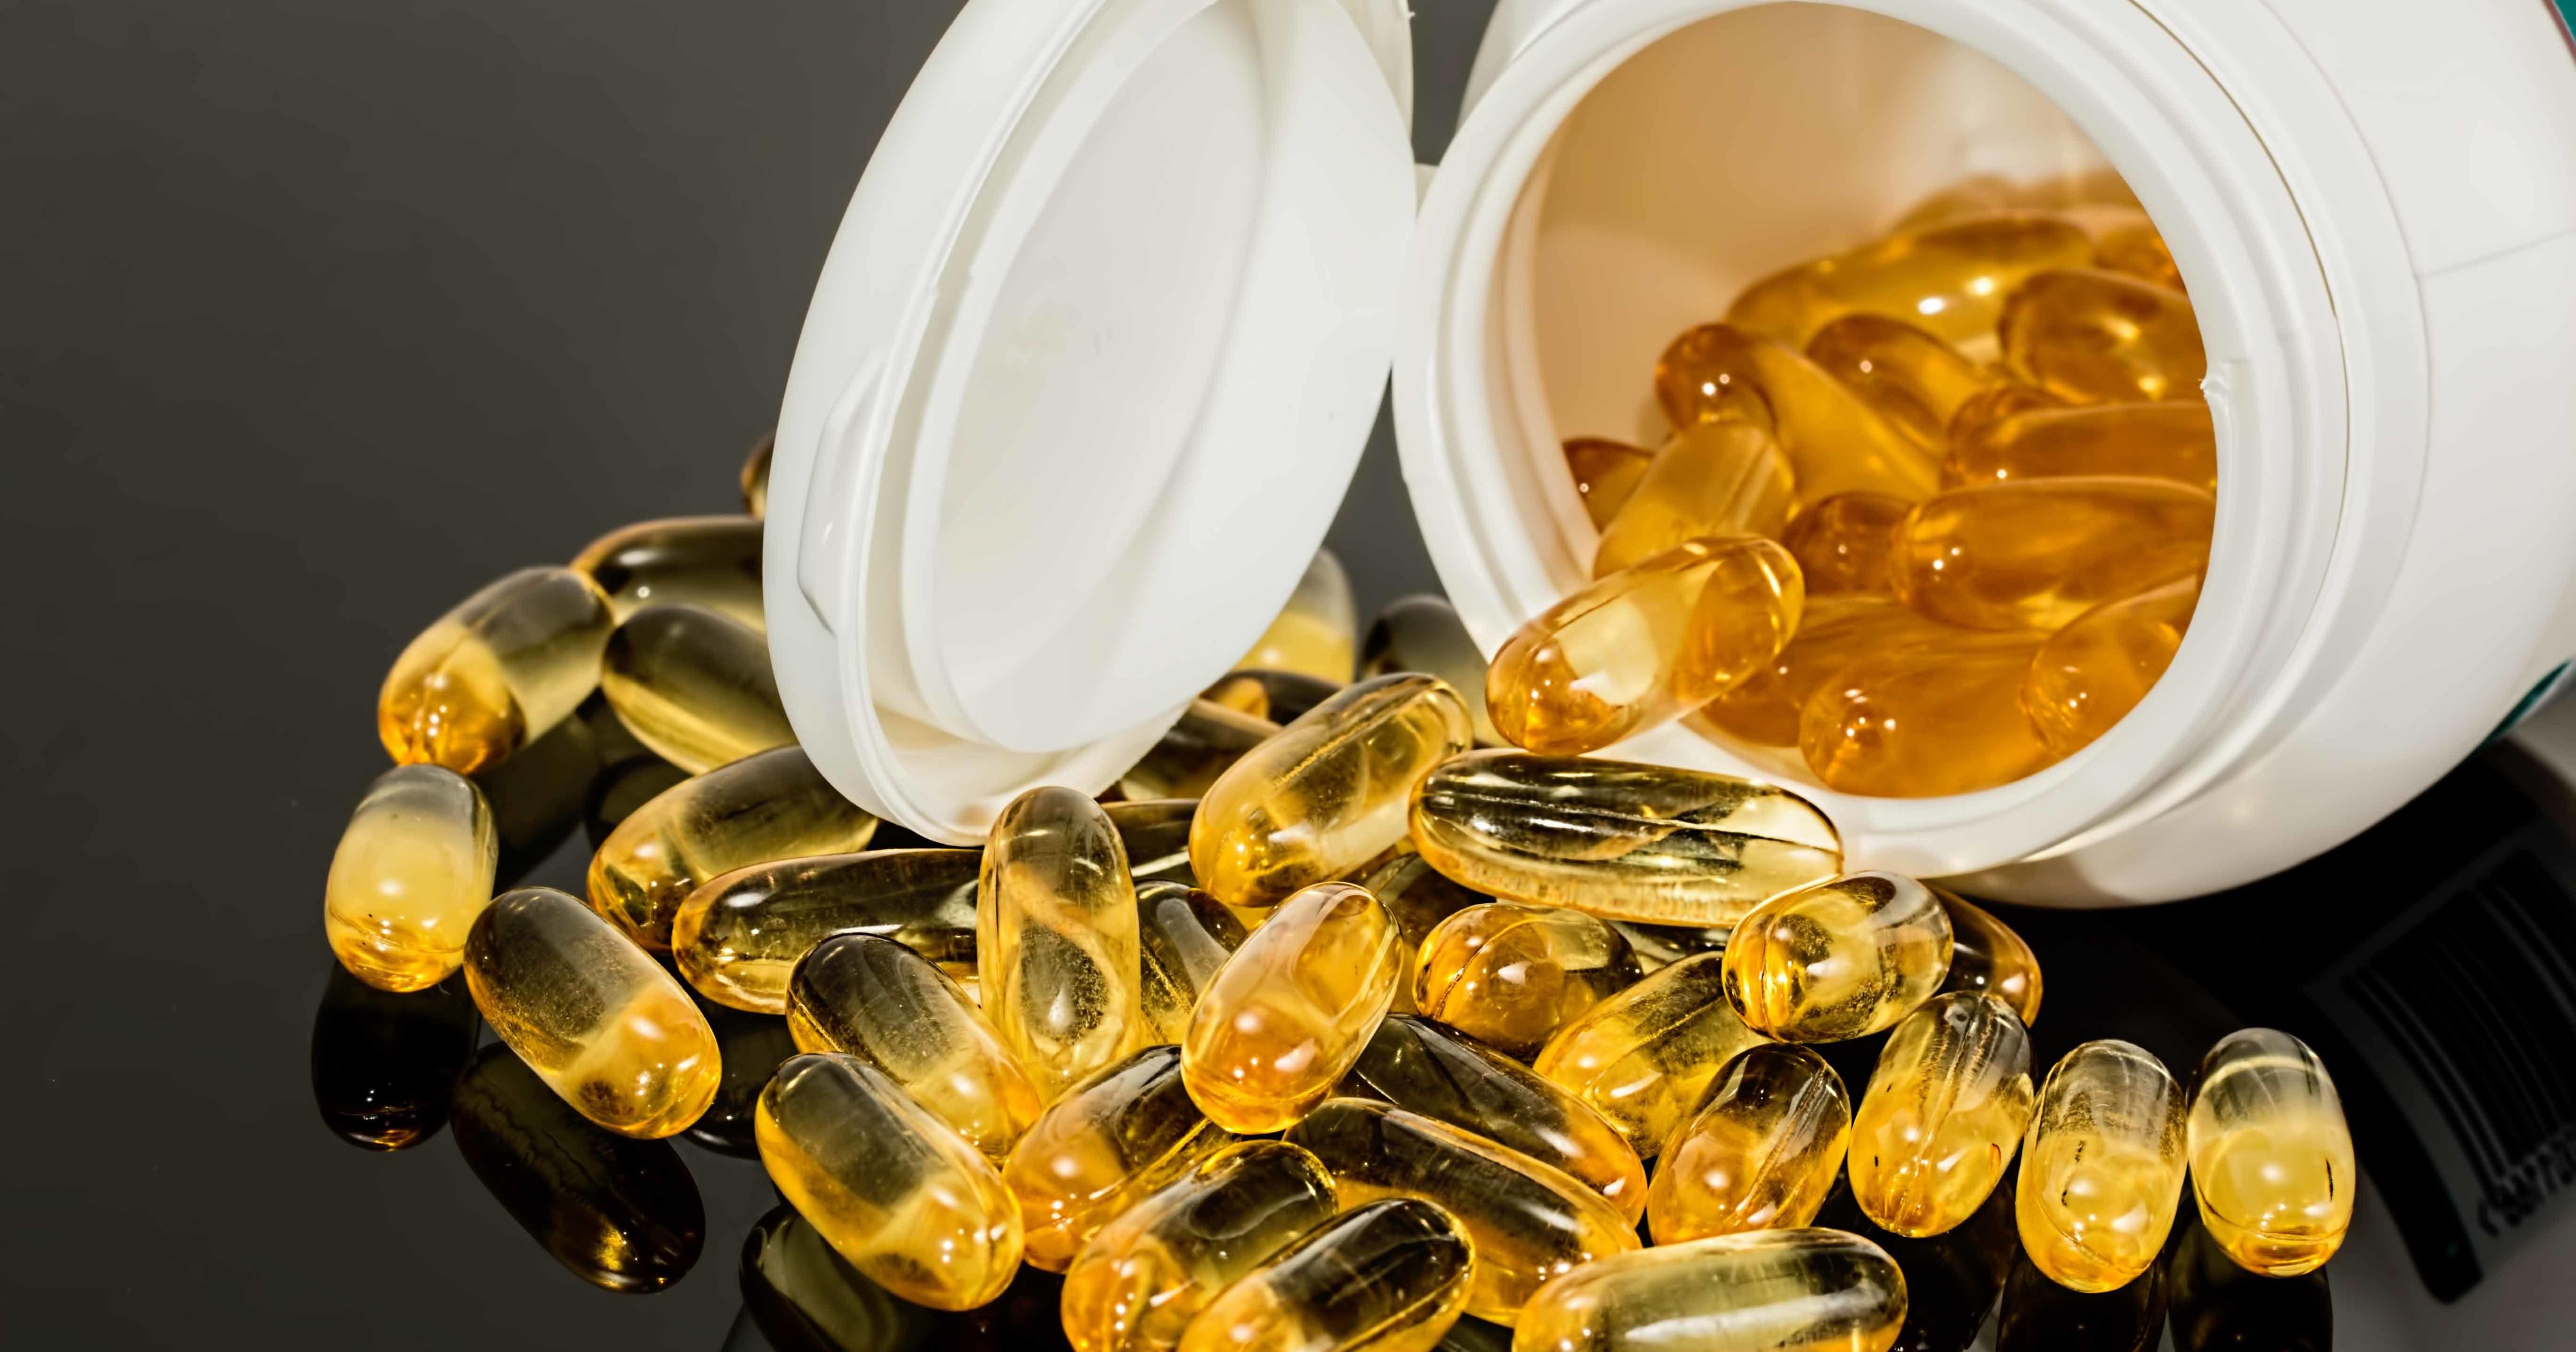 2. Vitamin obat-obatan lain